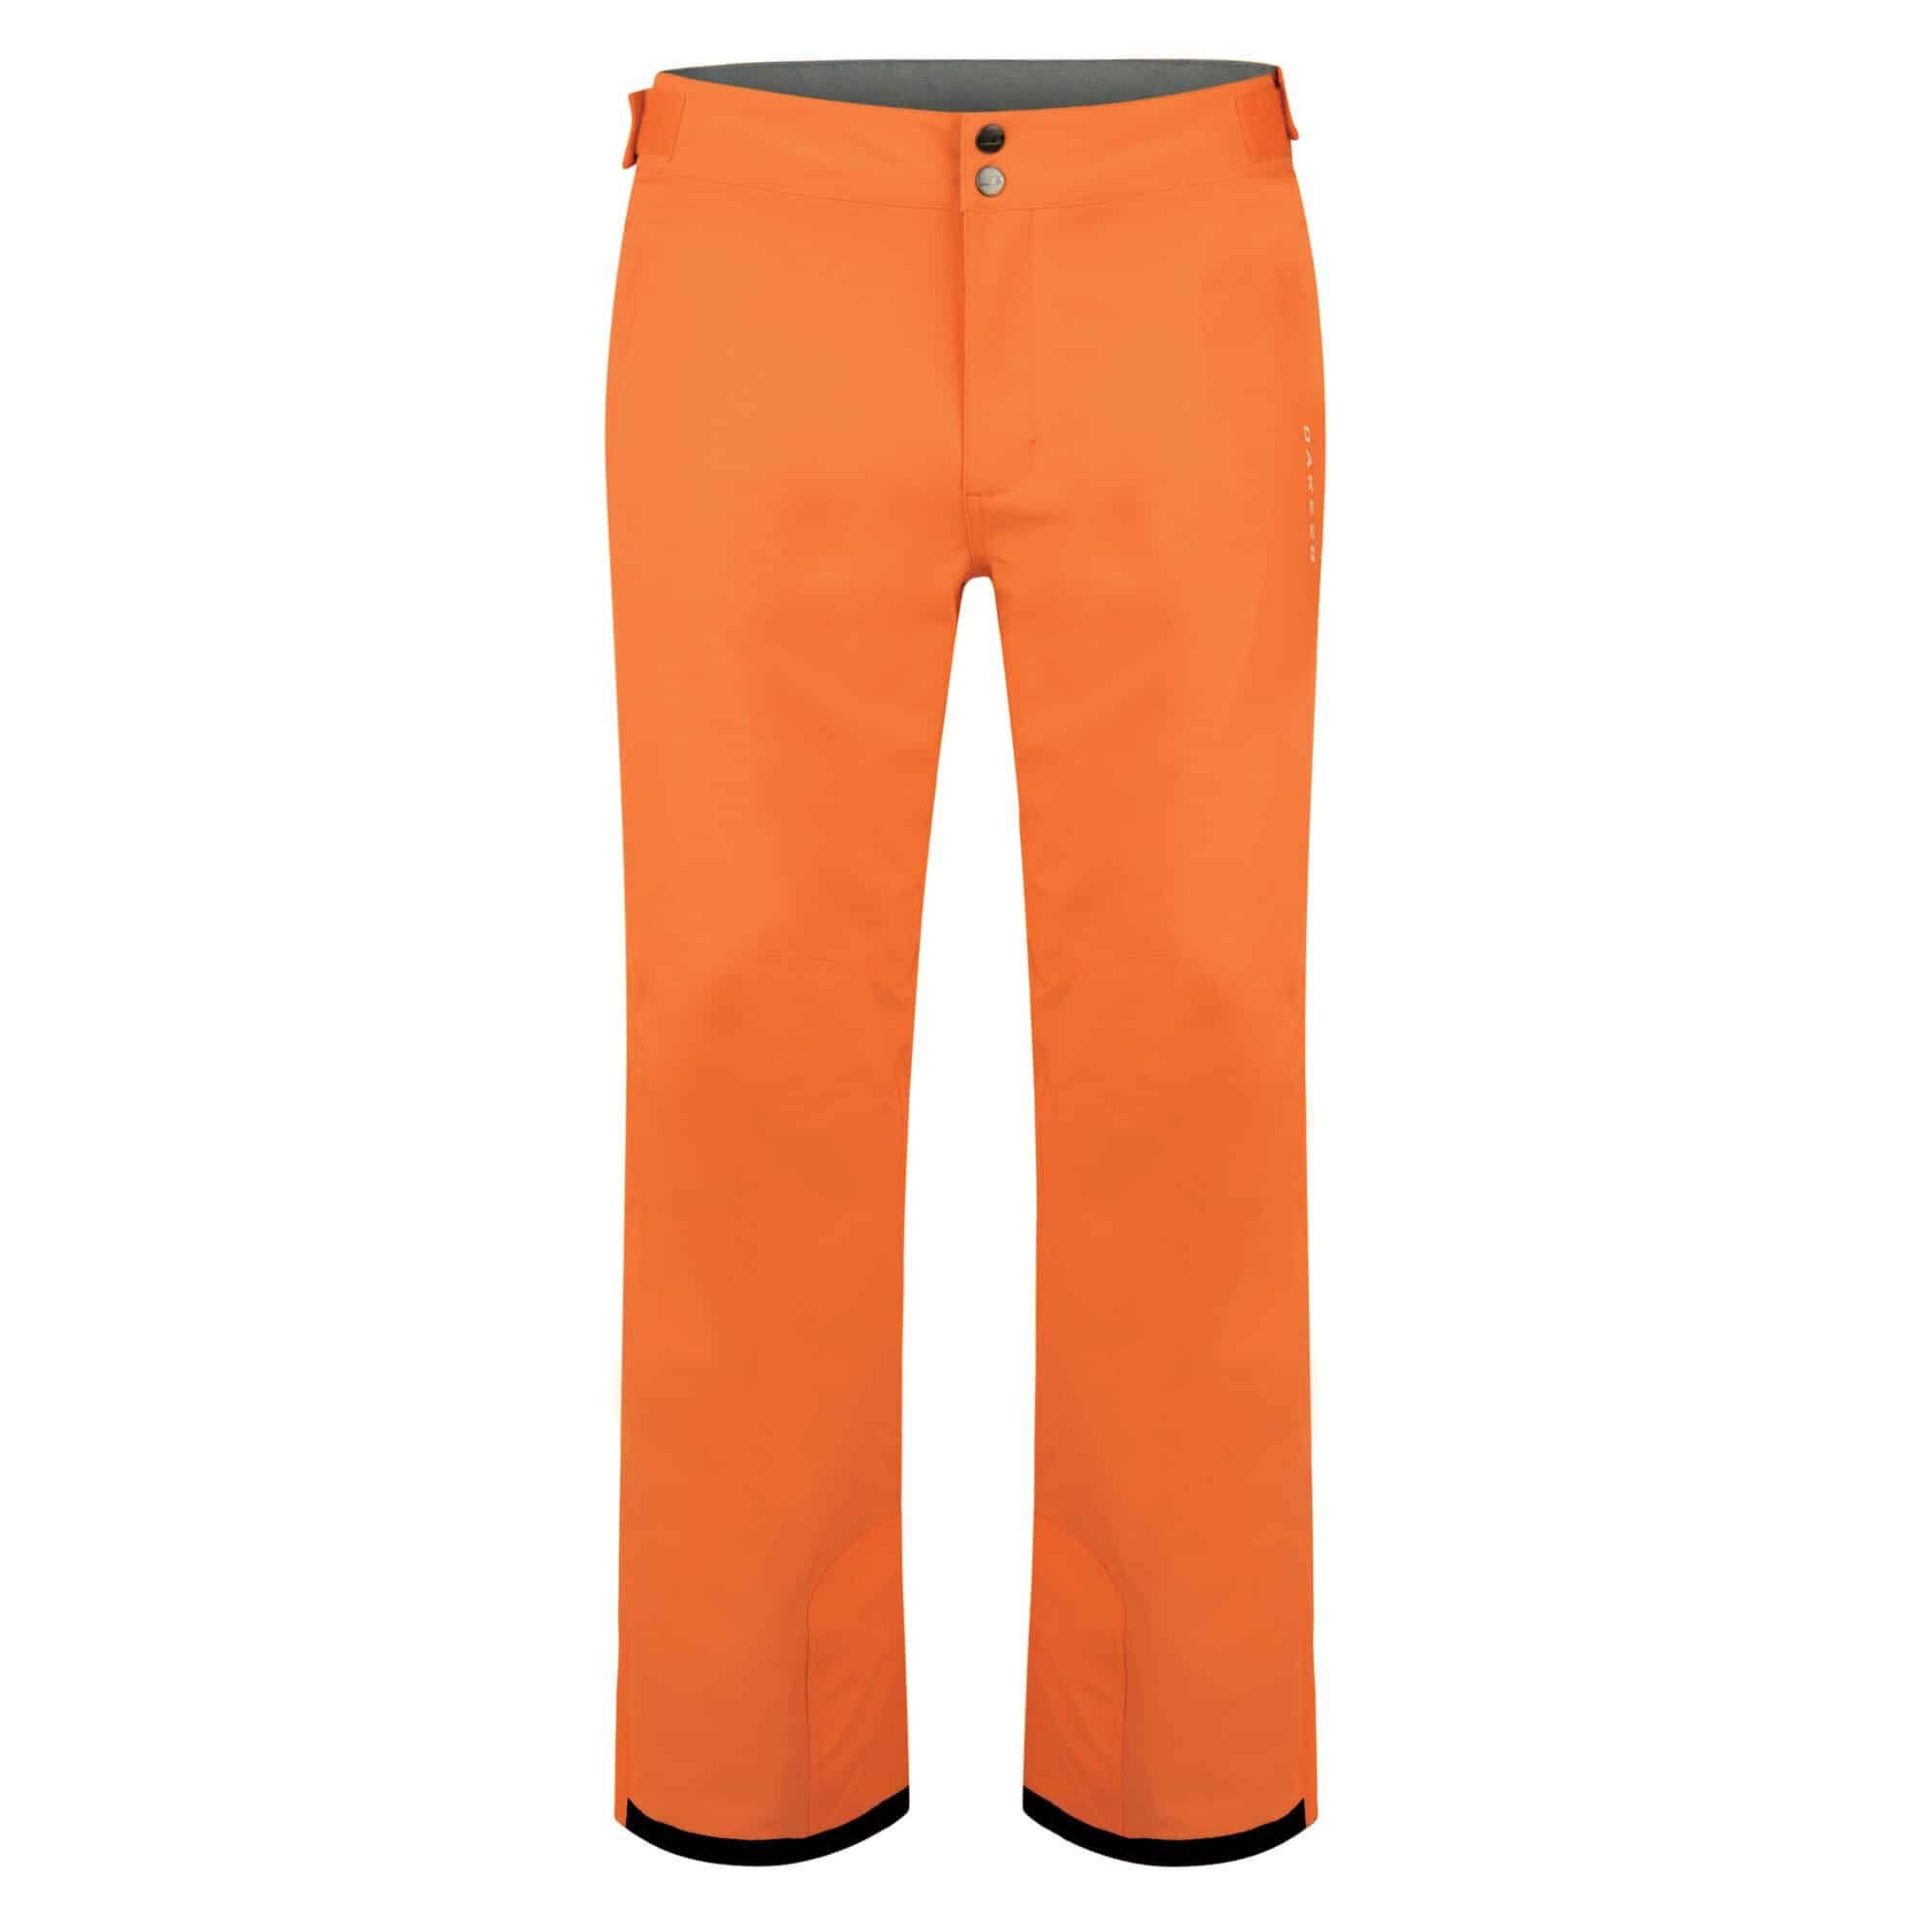 certify orange front